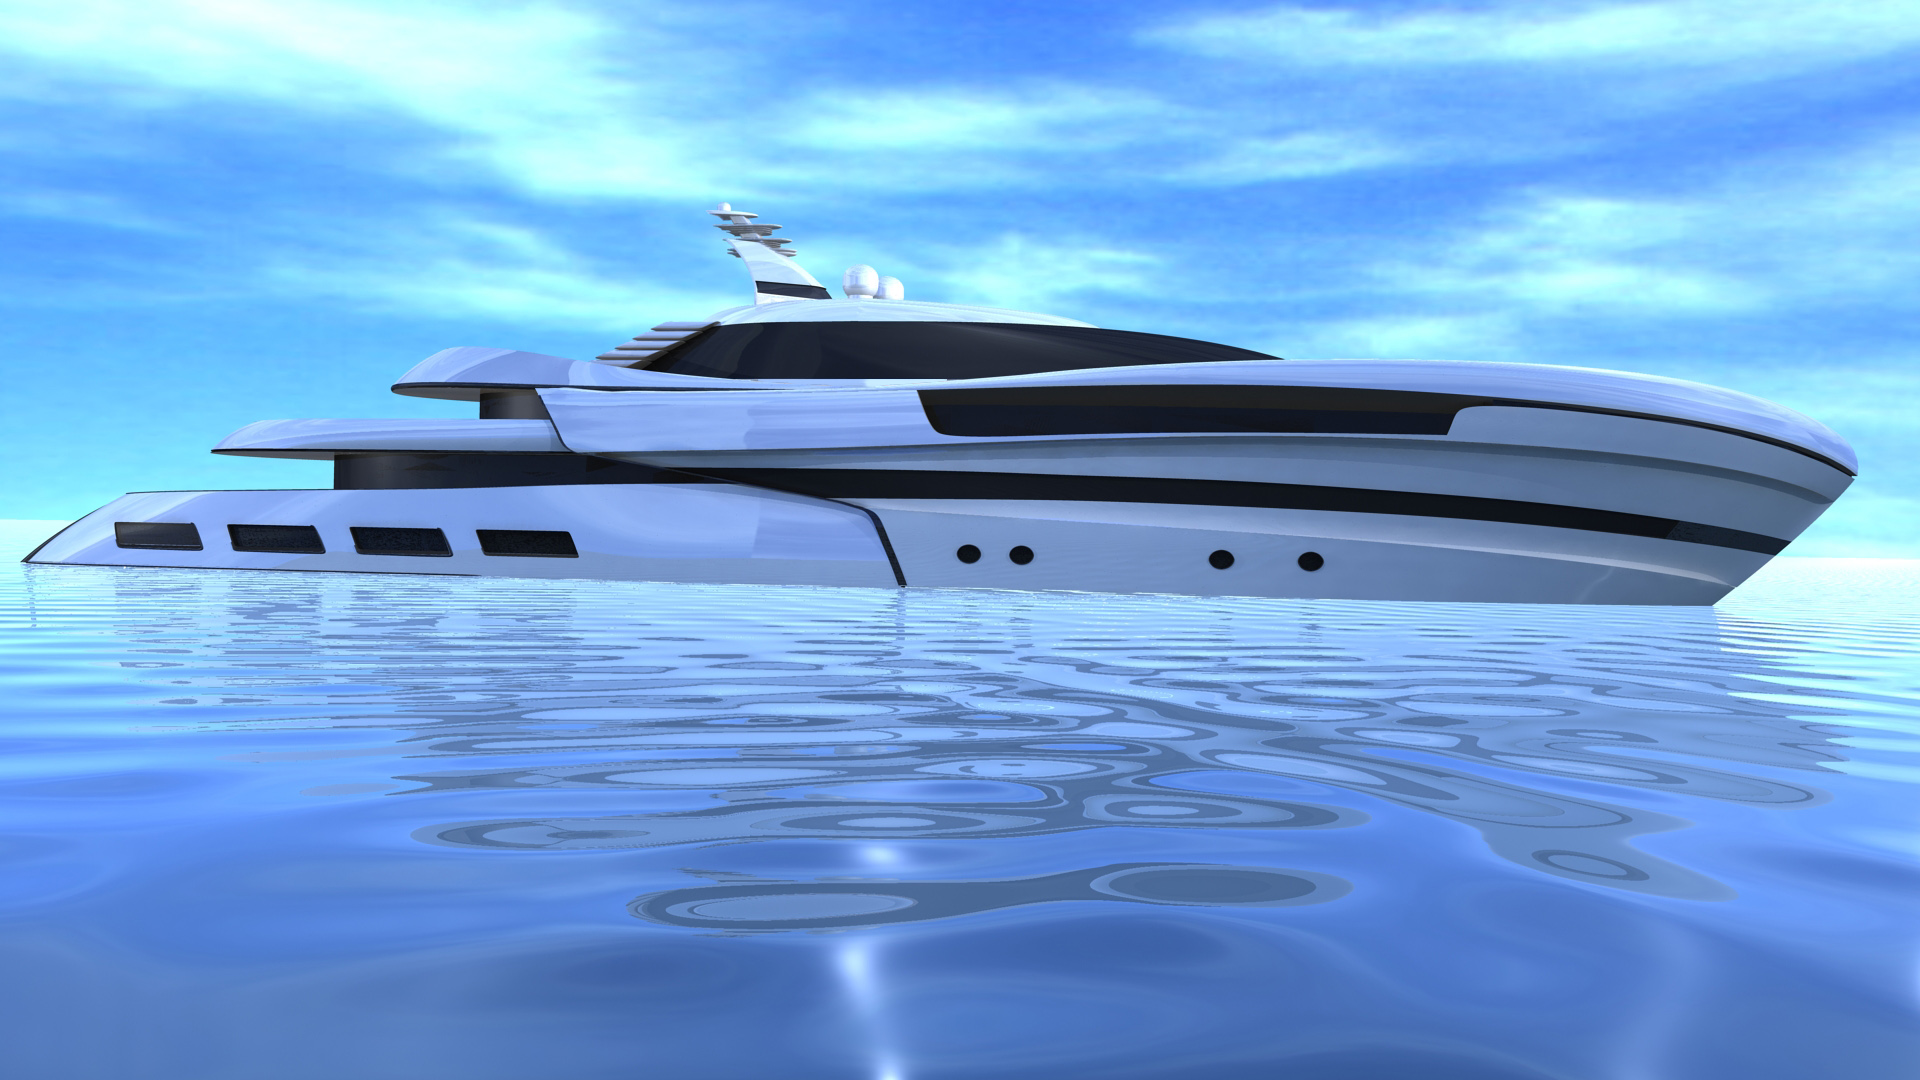 55m luxury yacht Project SMEW by Ira Petromanolaki of IPYD